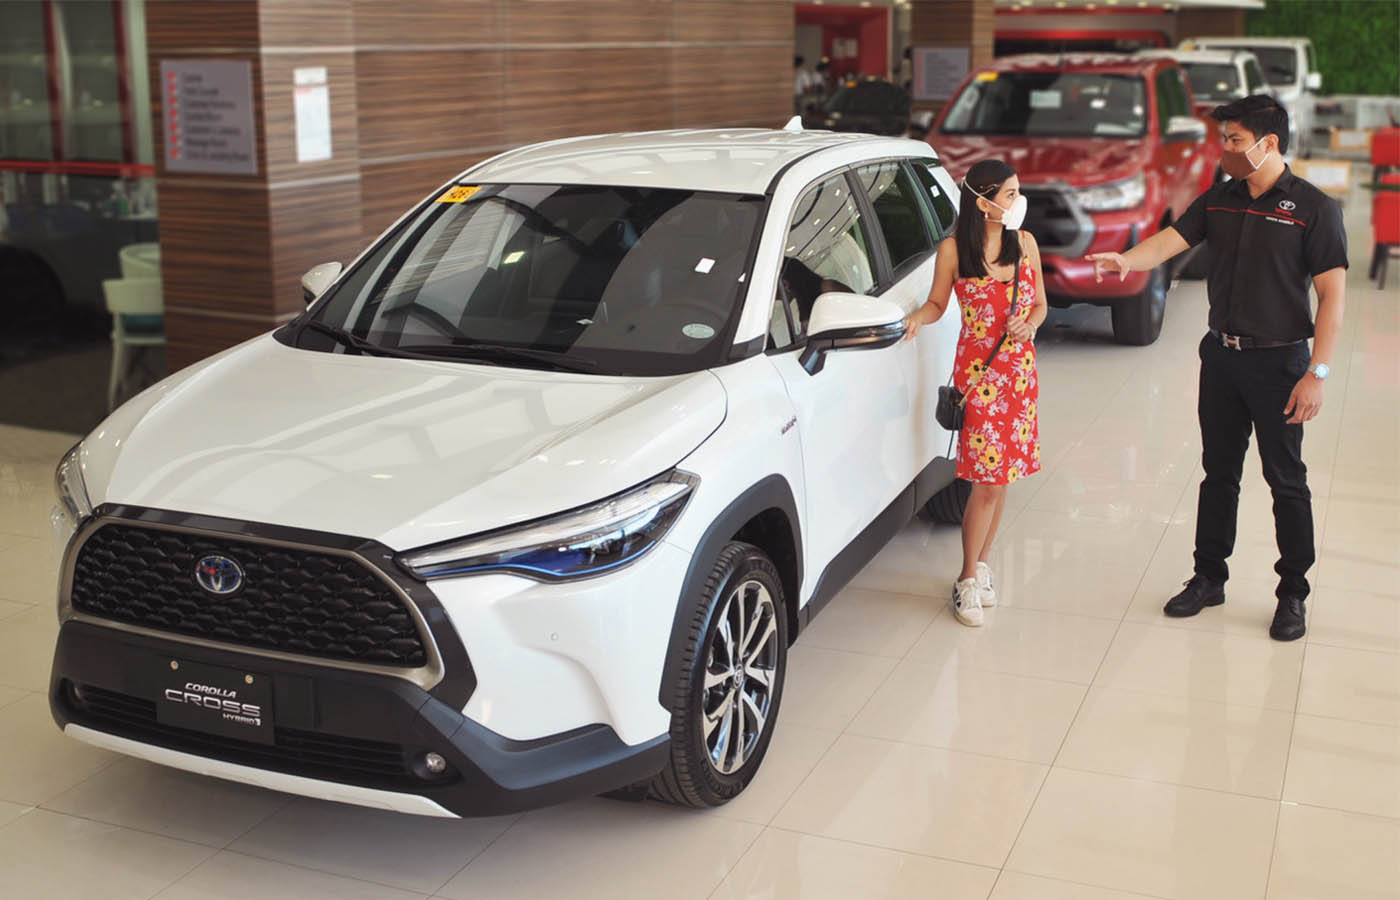 Test-driving the Toyota Corolla Cross in Cebu